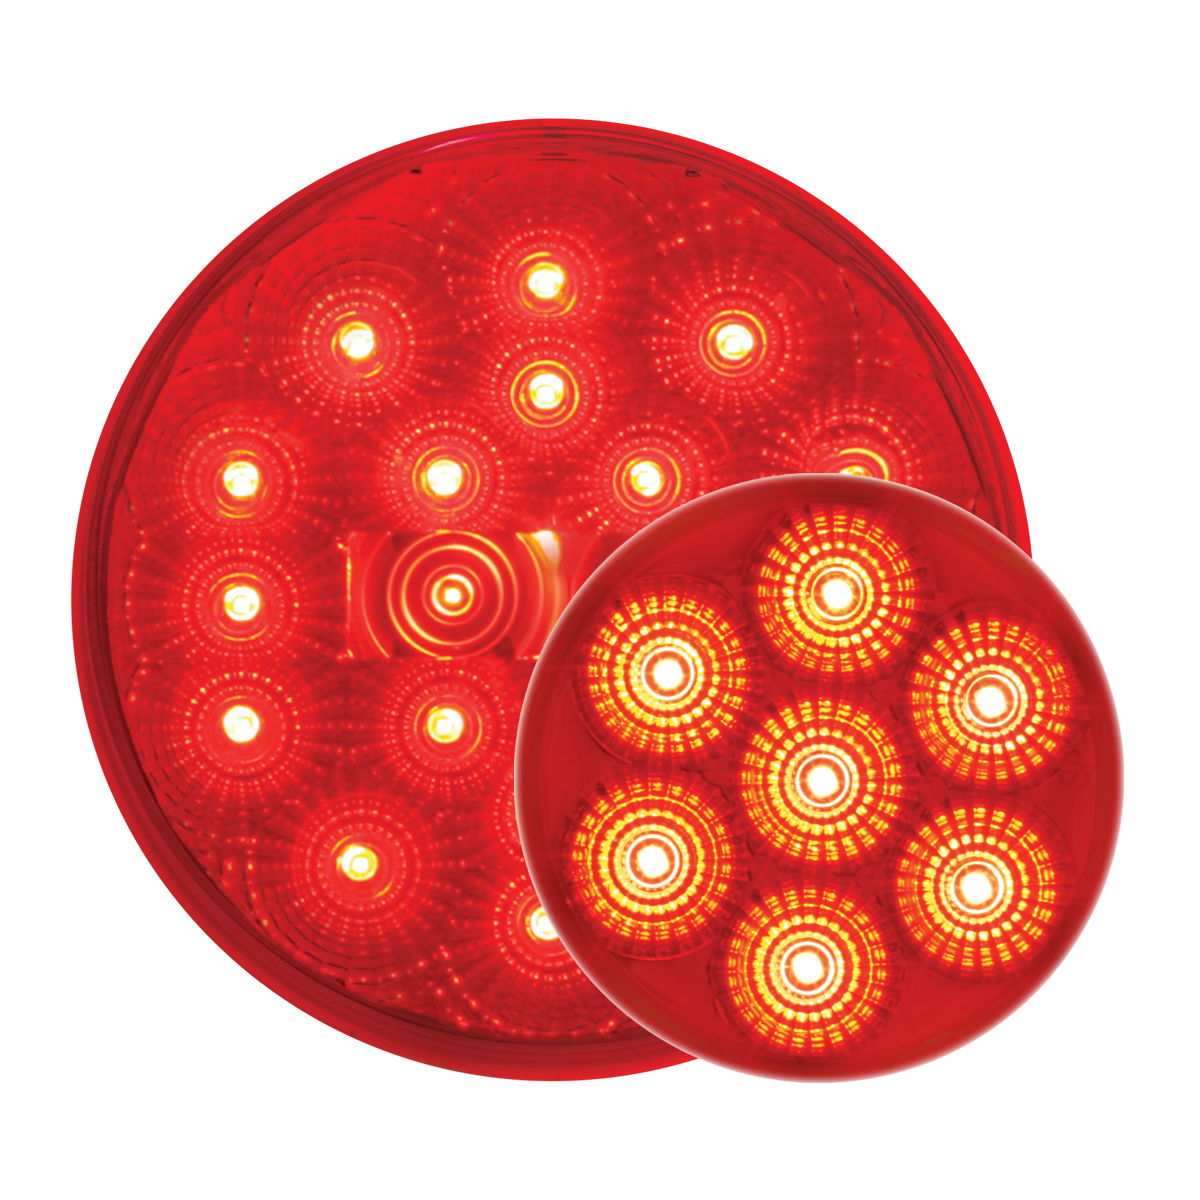 #77093/#76662 Spyder LED Red/Red - Flat